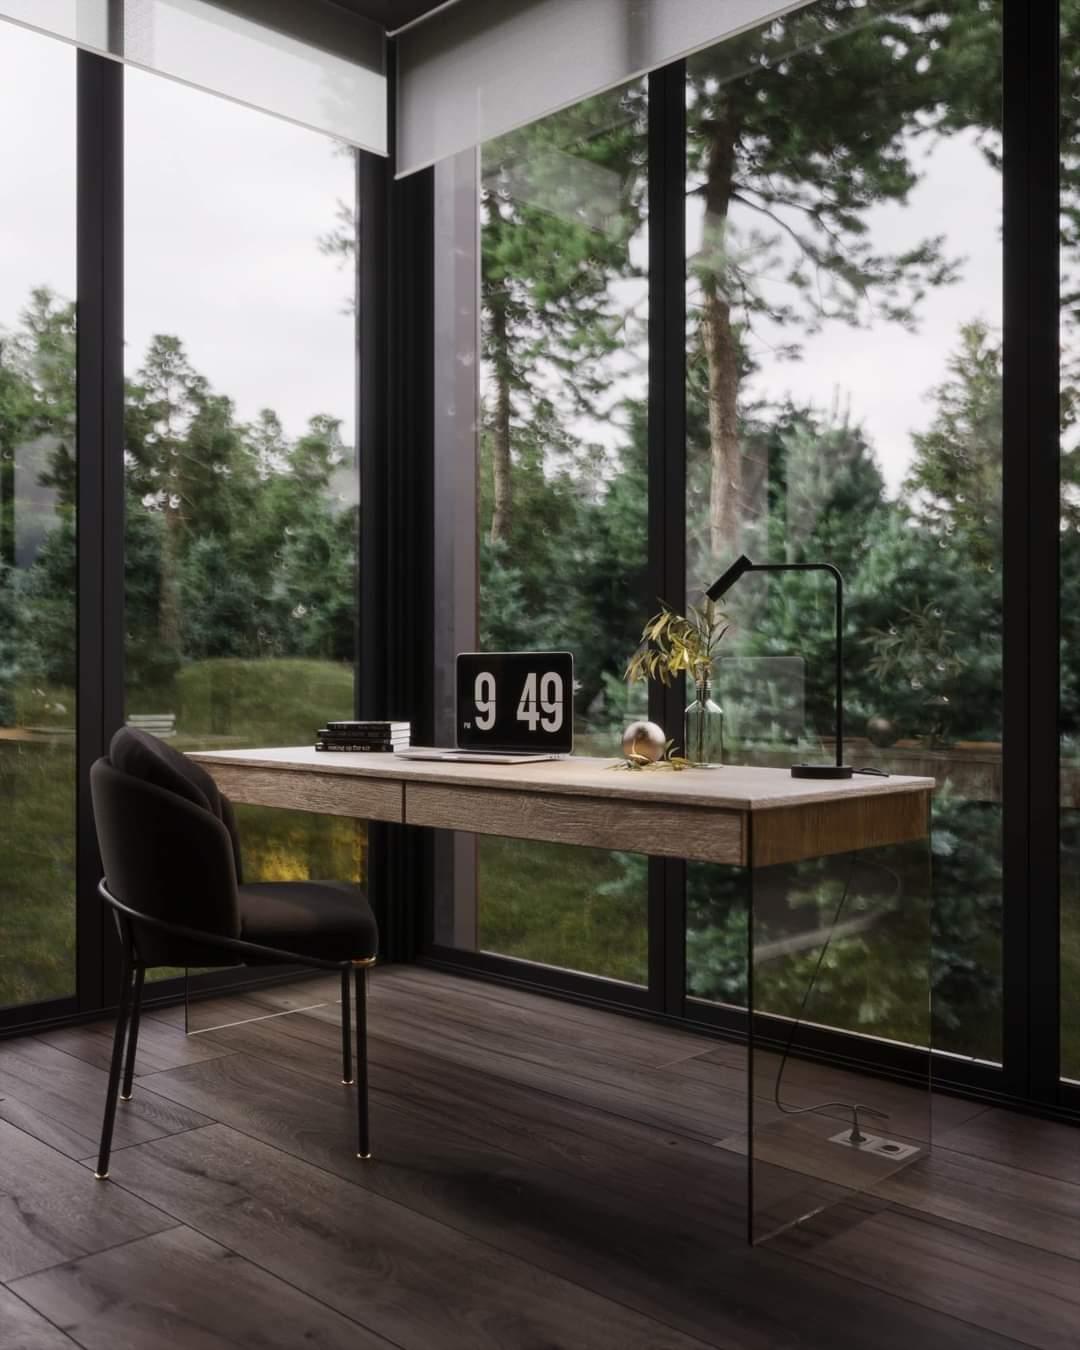 Beautiful Office Set Up - Source: Kireevaaanna